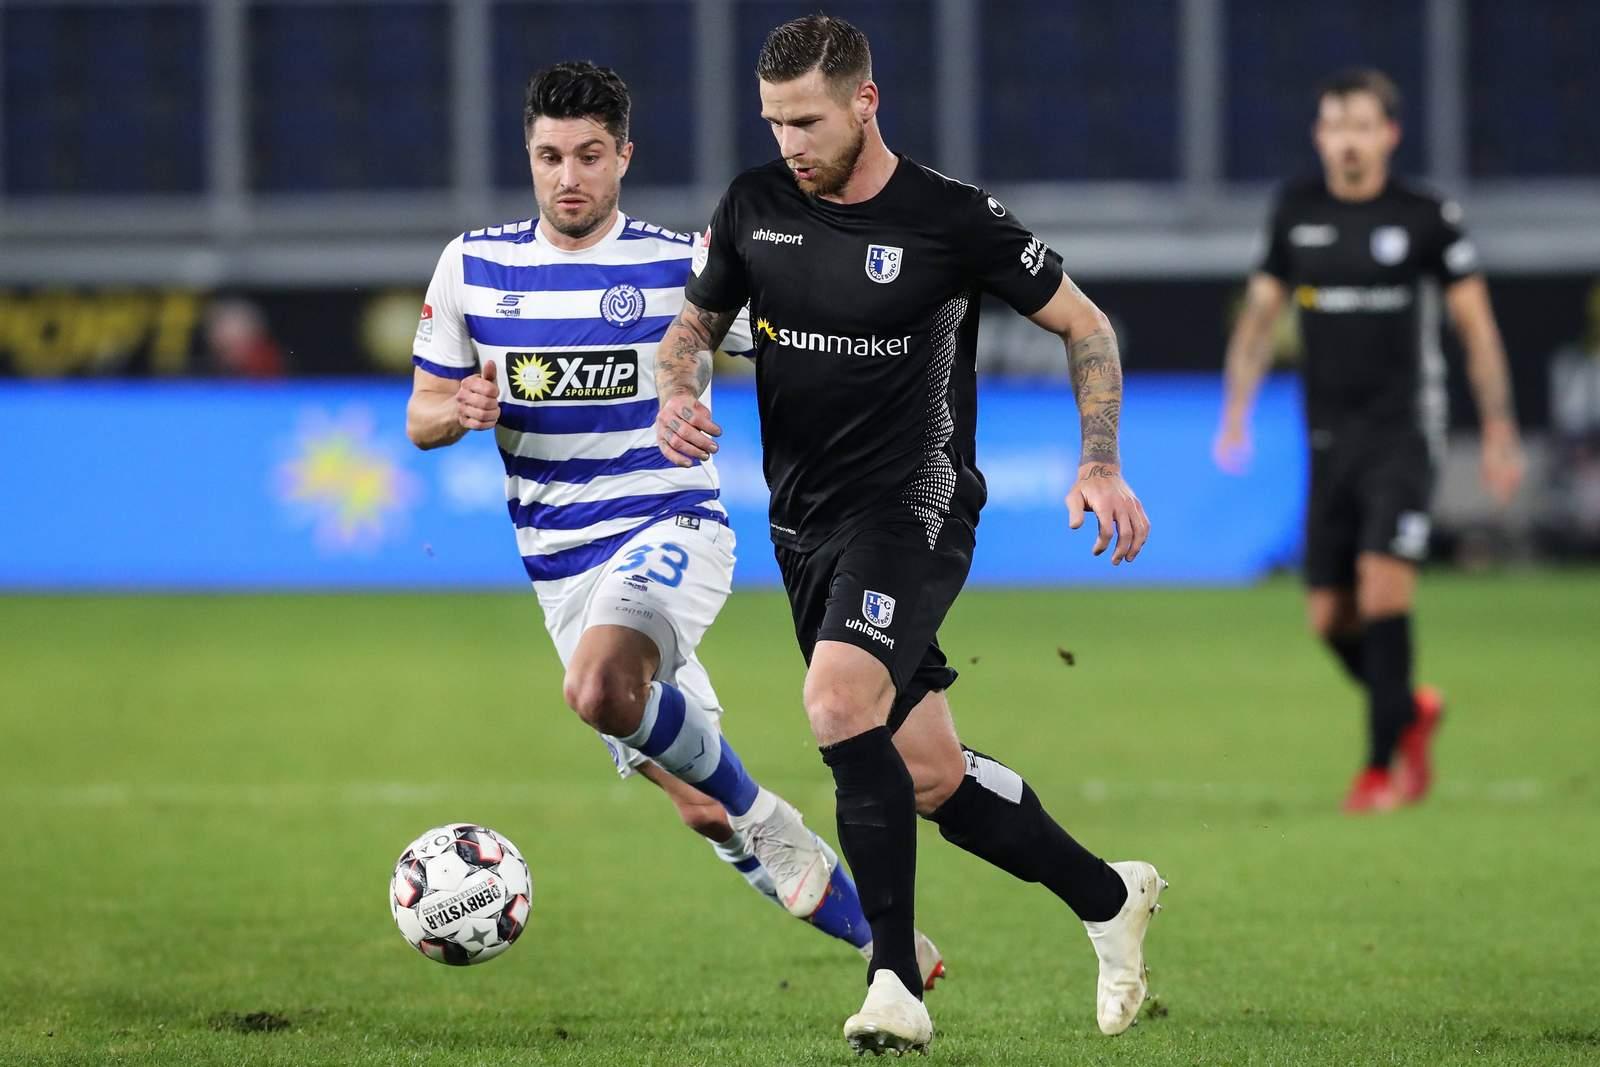 Timo Perthel vom 1. FC Magdeburg gegen Moritz Stoppelkamp vom MSV Duisburg